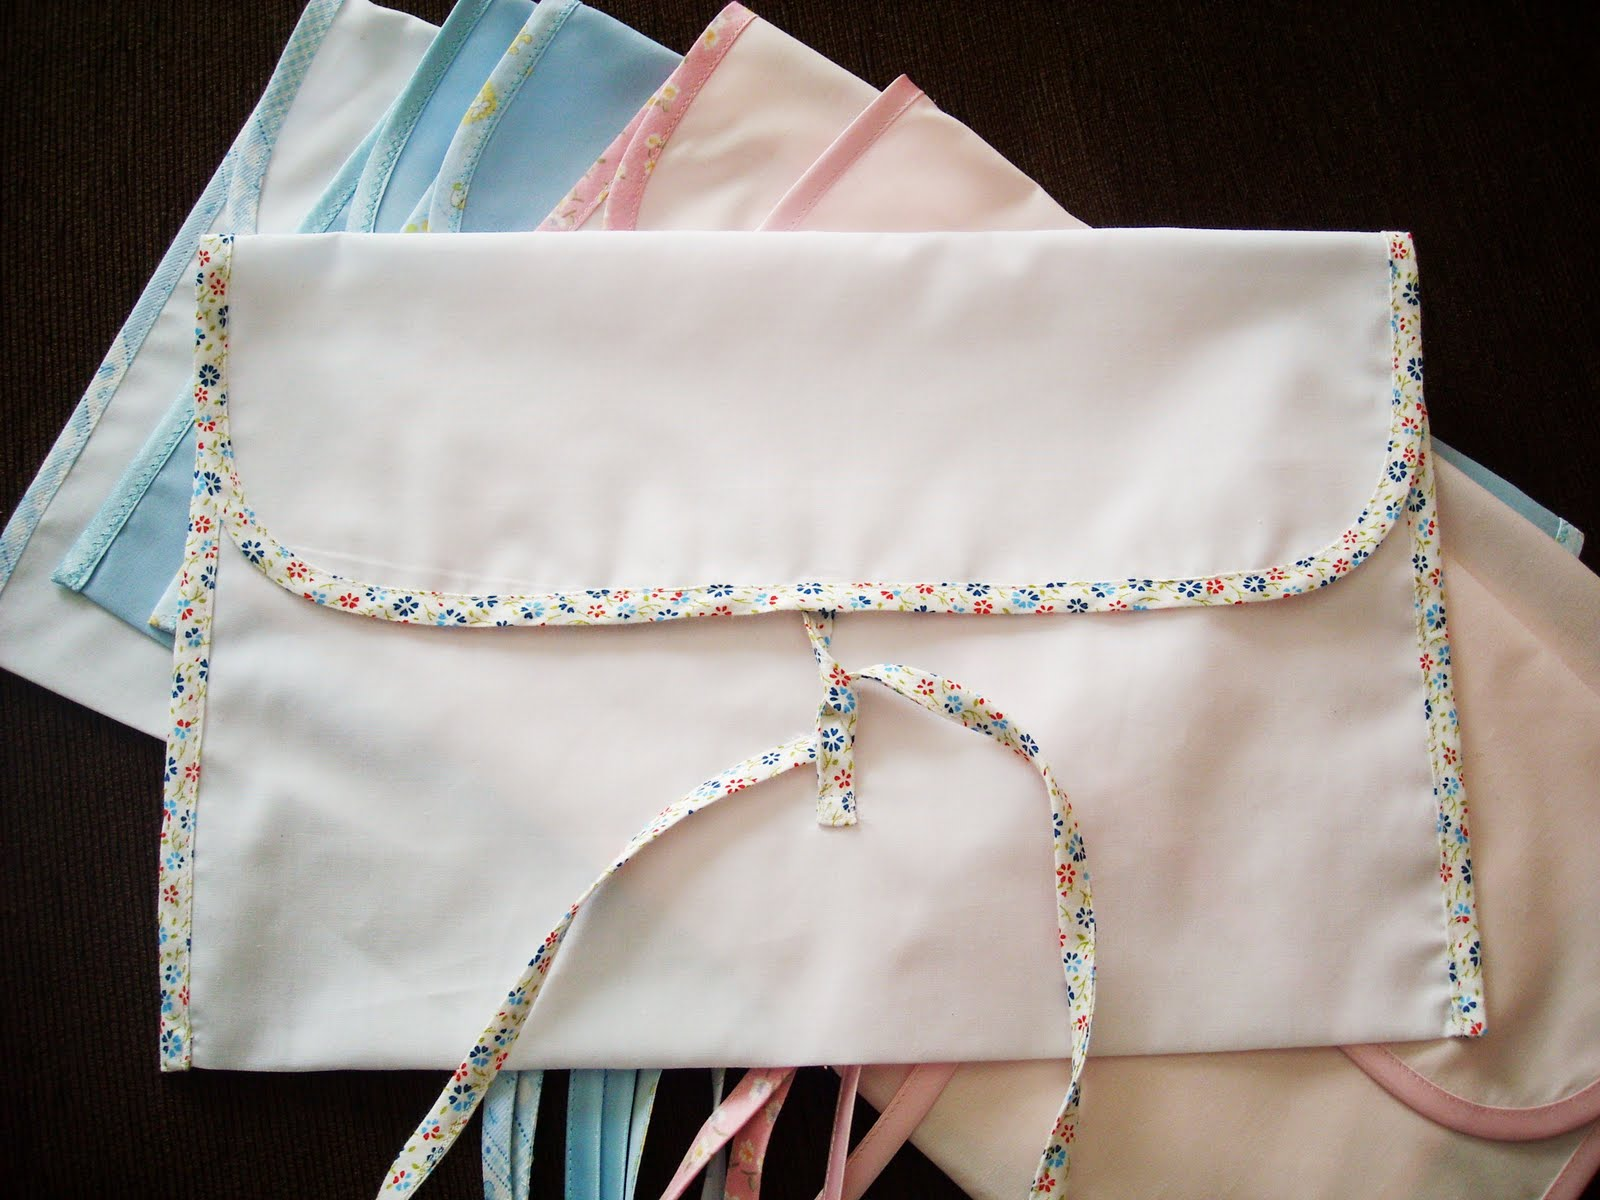 Artesania koniko 9 bolsas ropa de bebe - Bolsas para ropa ...